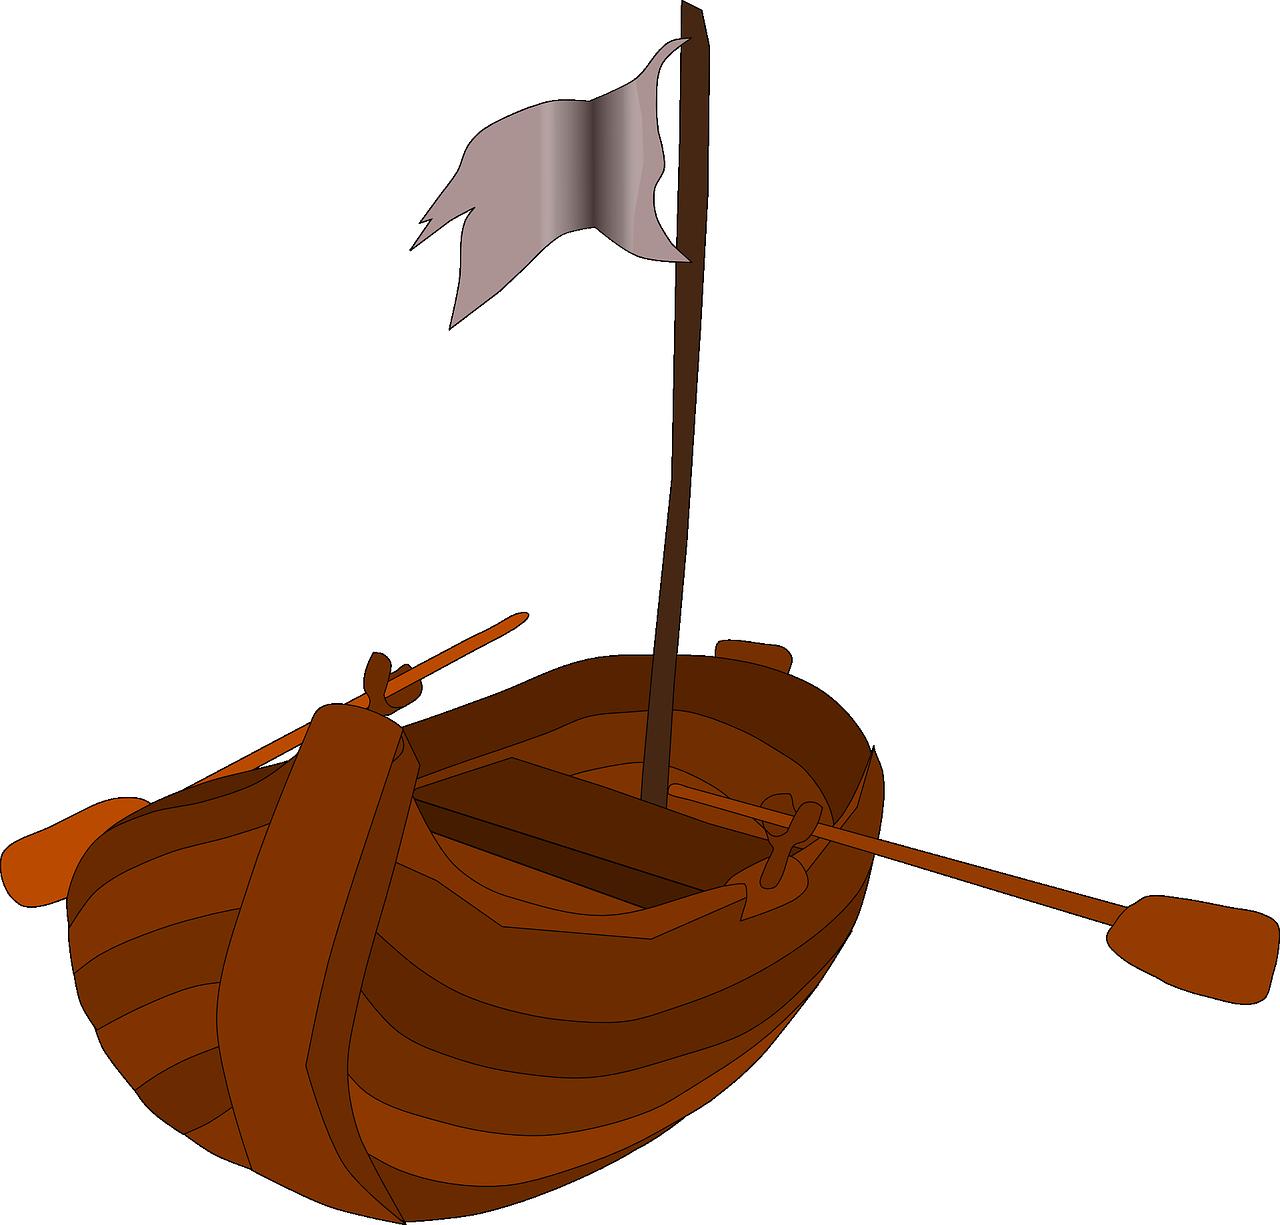 Free to Use & Public Domain Boat Clip Art.